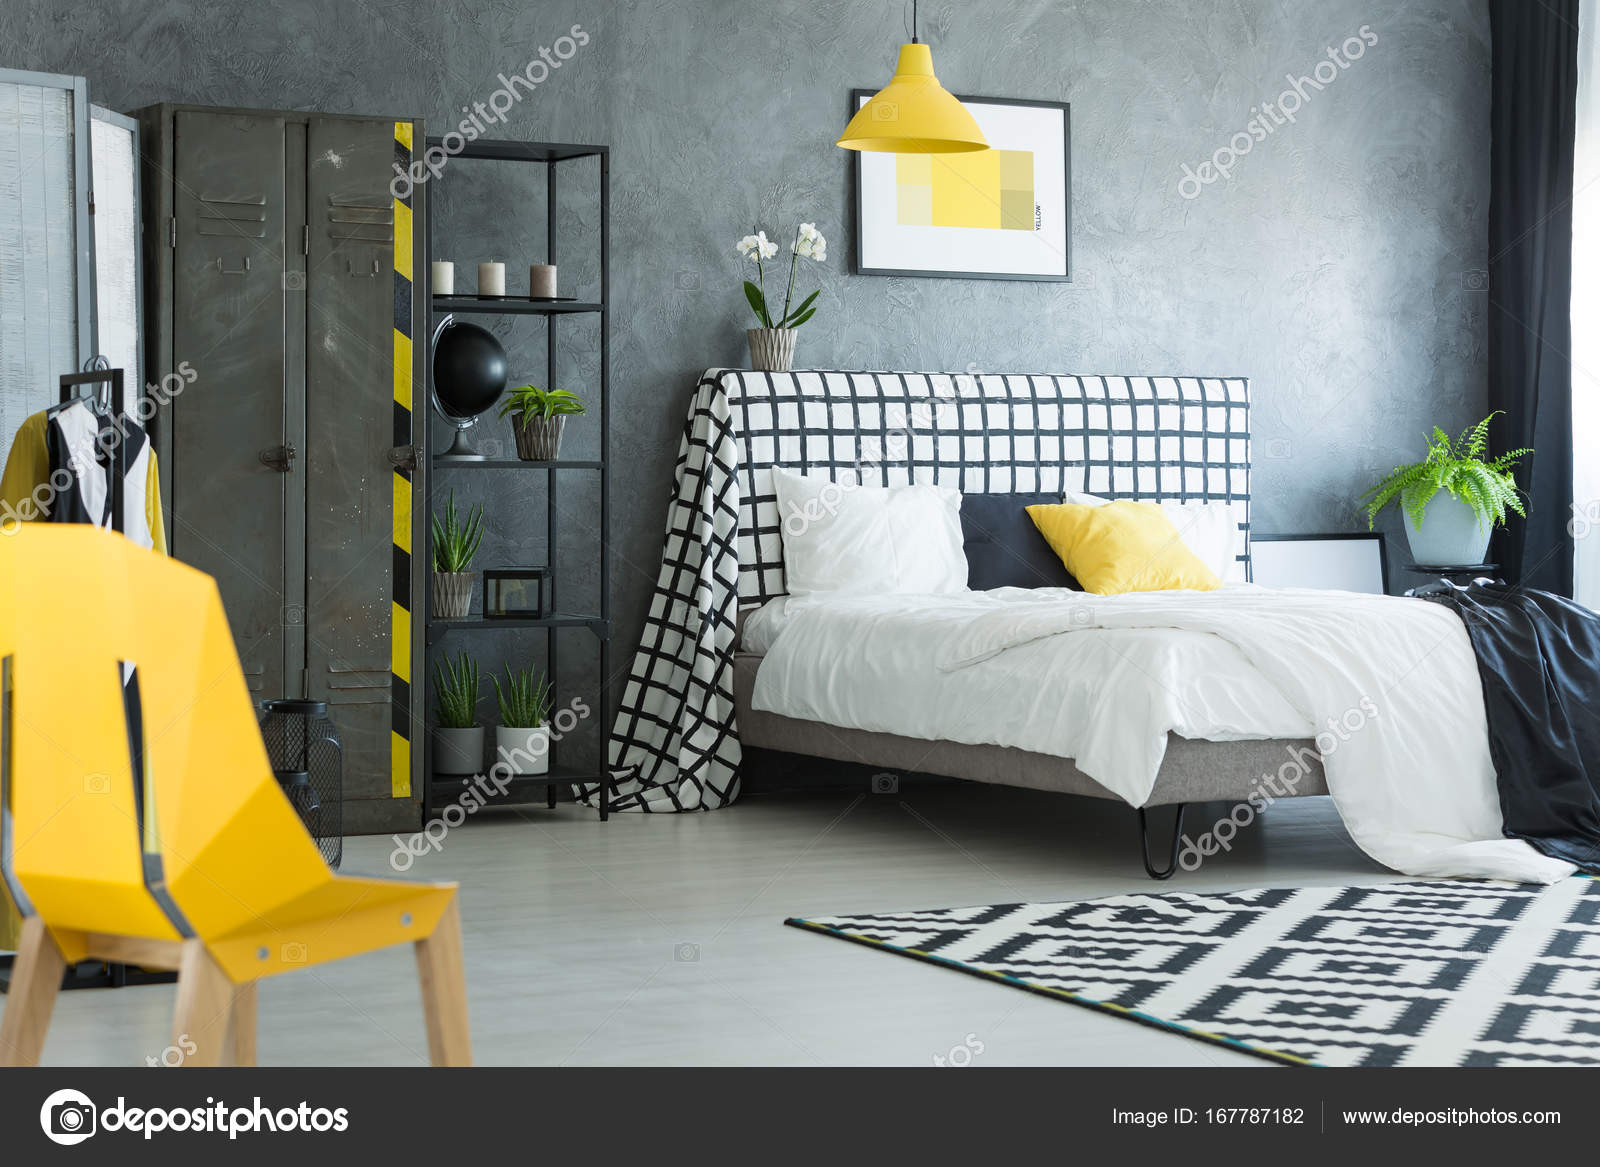 Gele ontwerper stoel in slaapkamer — Stockfoto © photographee.eu ...